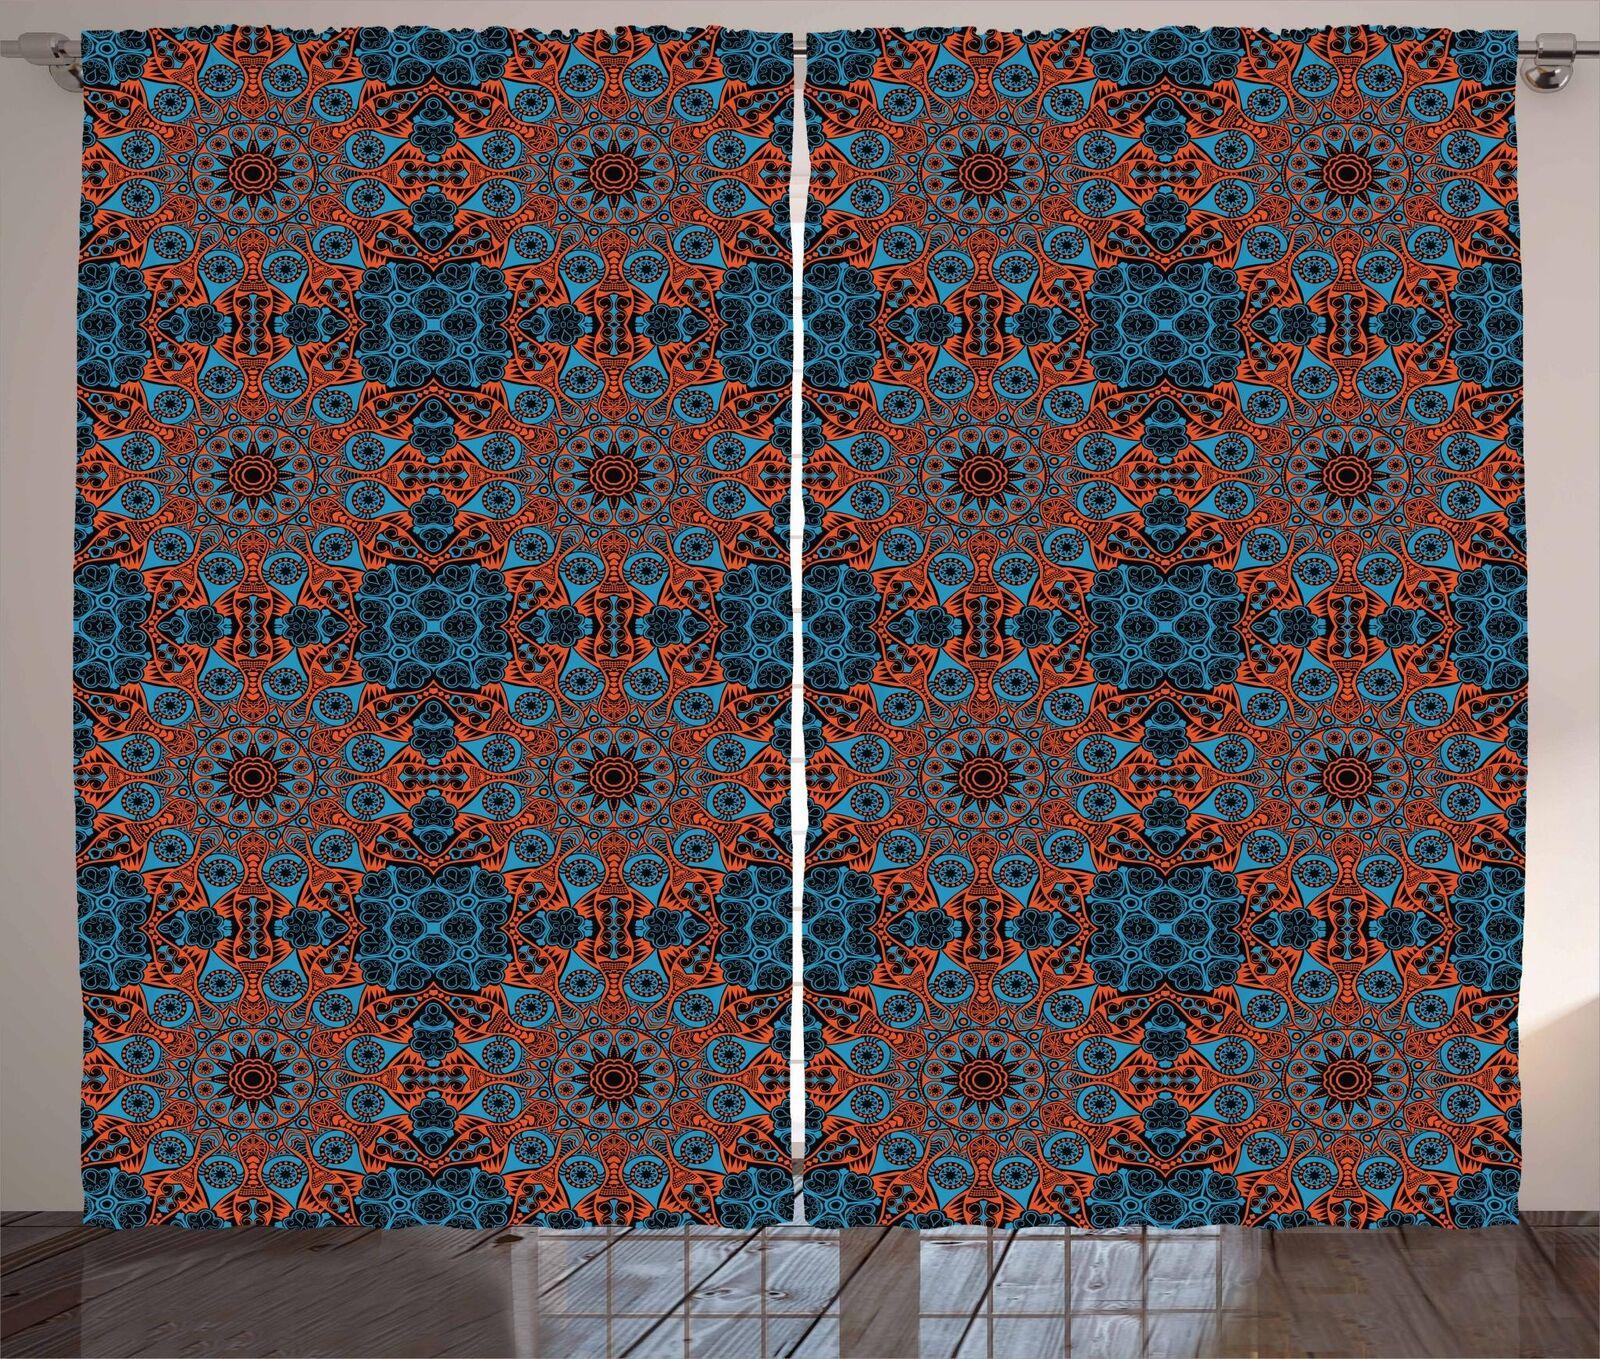 Arabesque Mandala Curtains 2 Panel Set Decoration 5 Dimensiones Window Drapes